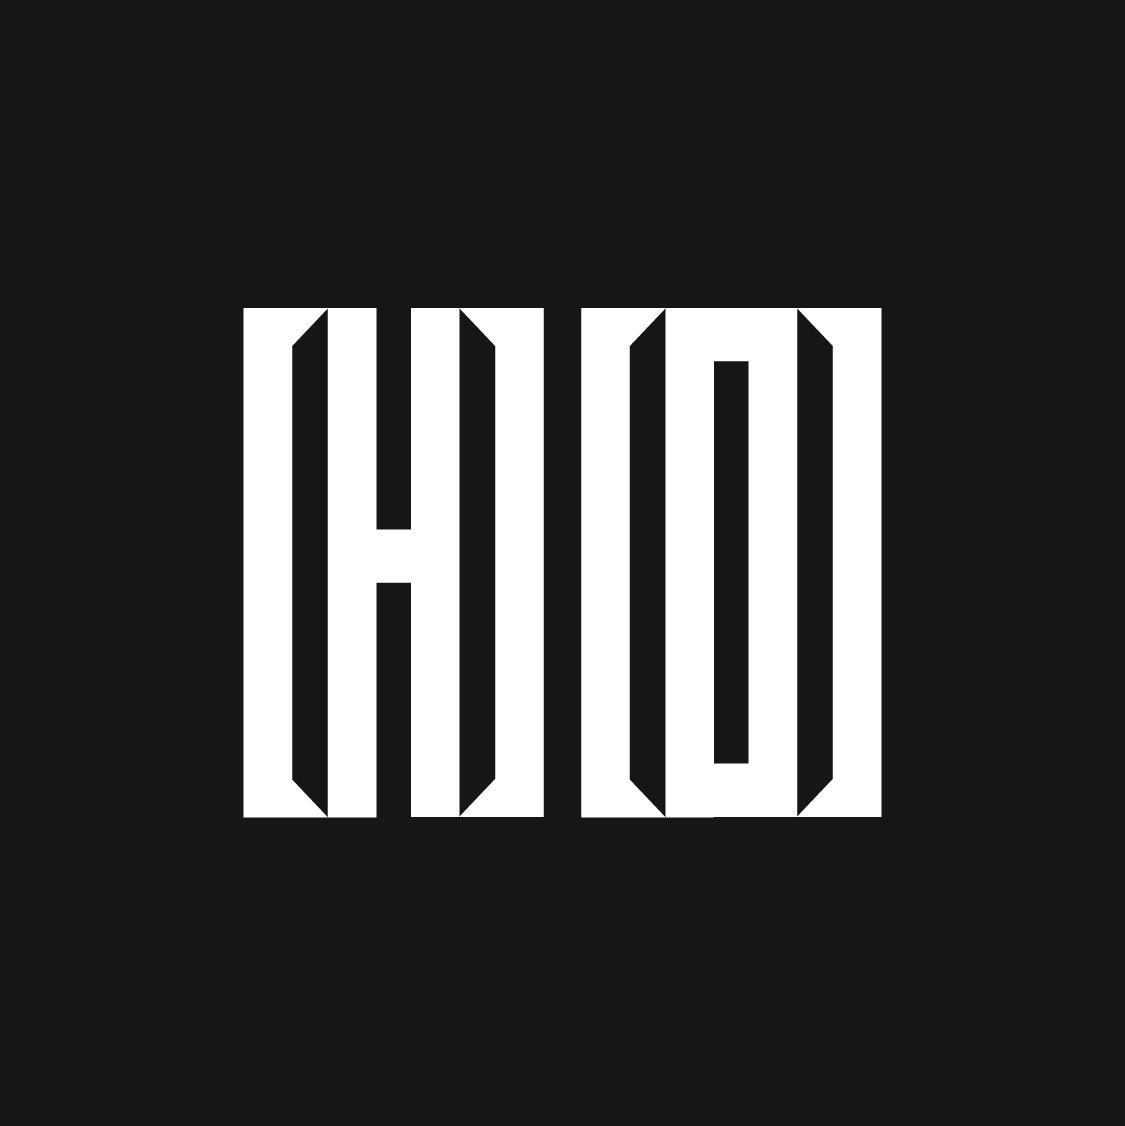 all-logos-2020-59